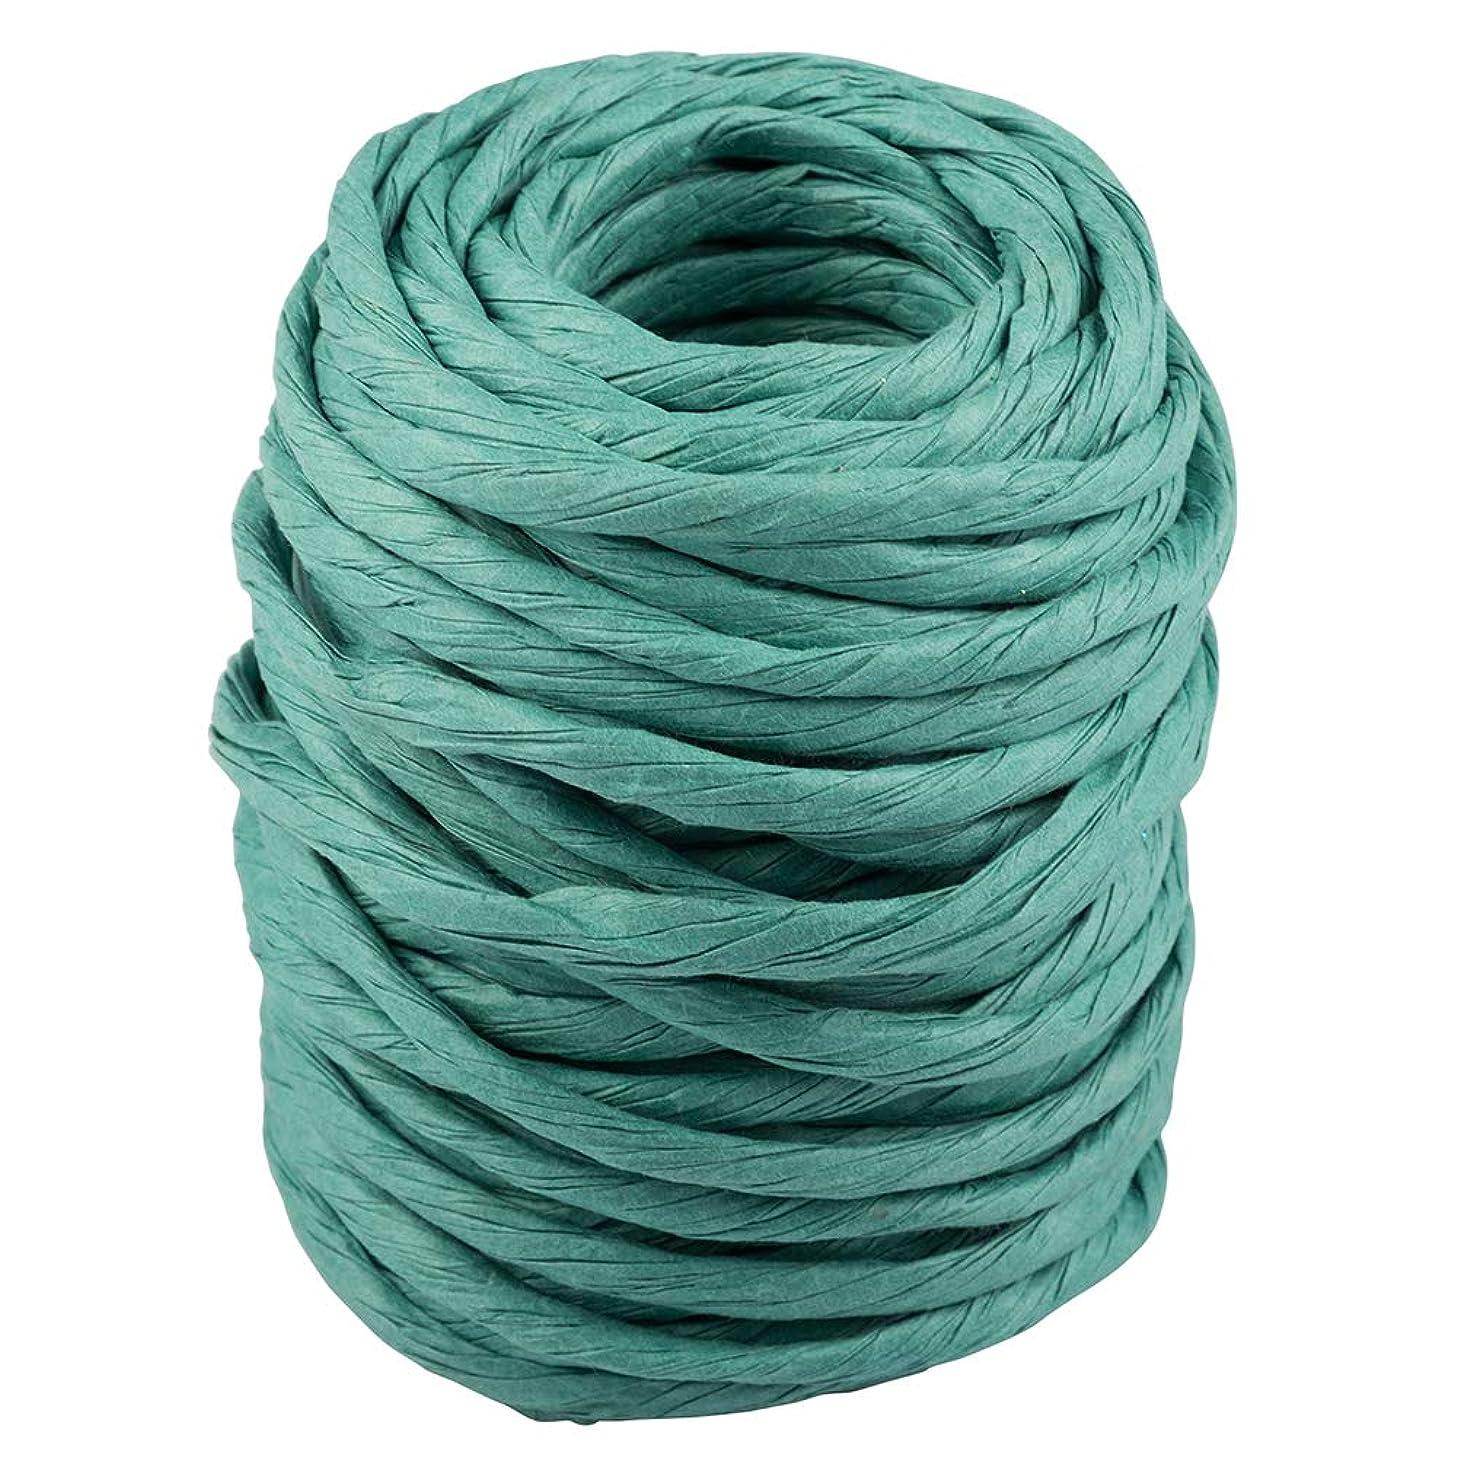 JAM Paper Twisted Kraft Ribbon - 25 Yards - Green - Sold individually